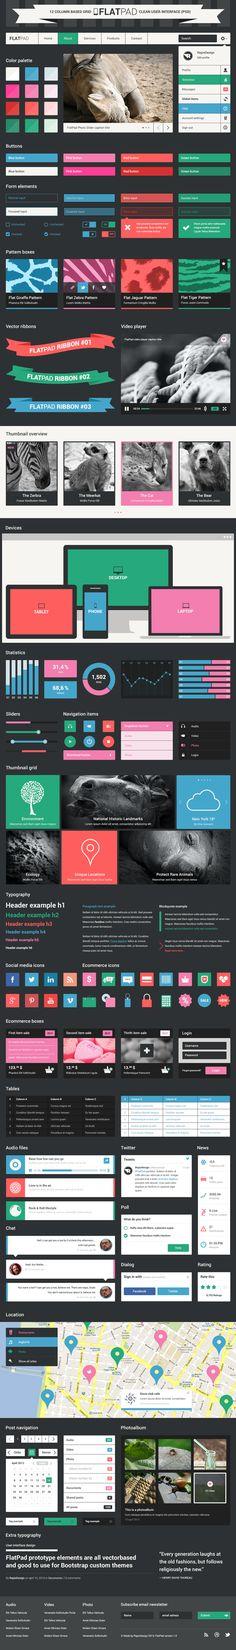 FlatPad Dark clean user interface (PSD), 12-column Grid by Repix Design, via Behance